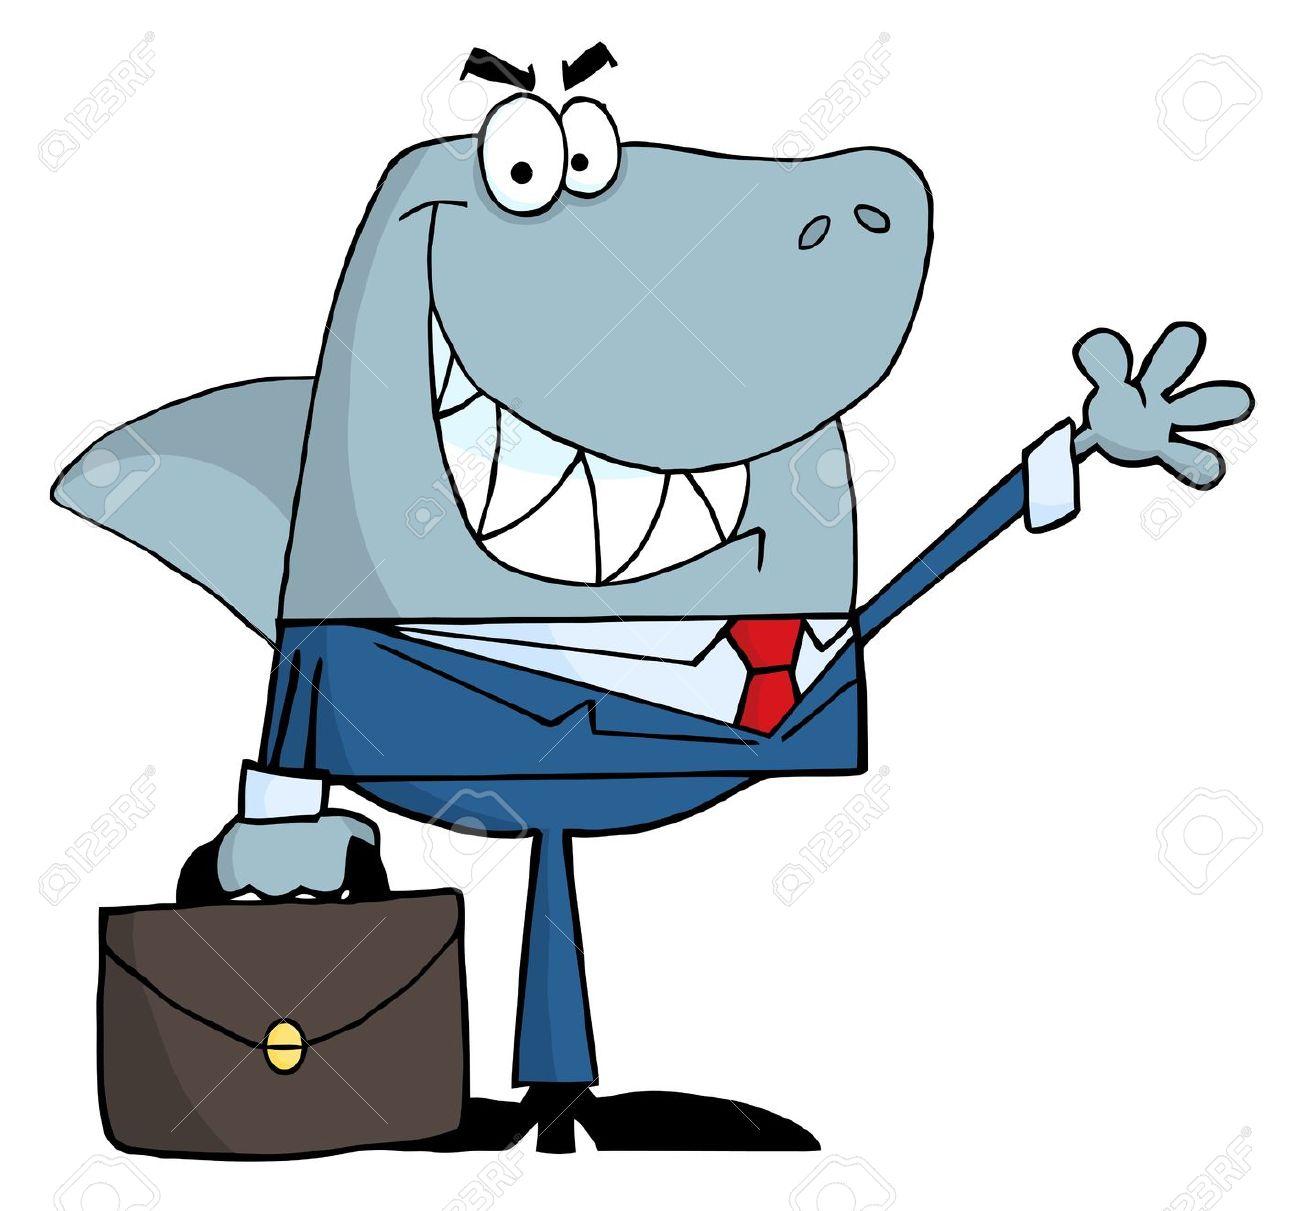 Loan shark clipart vector royalty free library Loan shark clipart - ClipartFest vector royalty free library